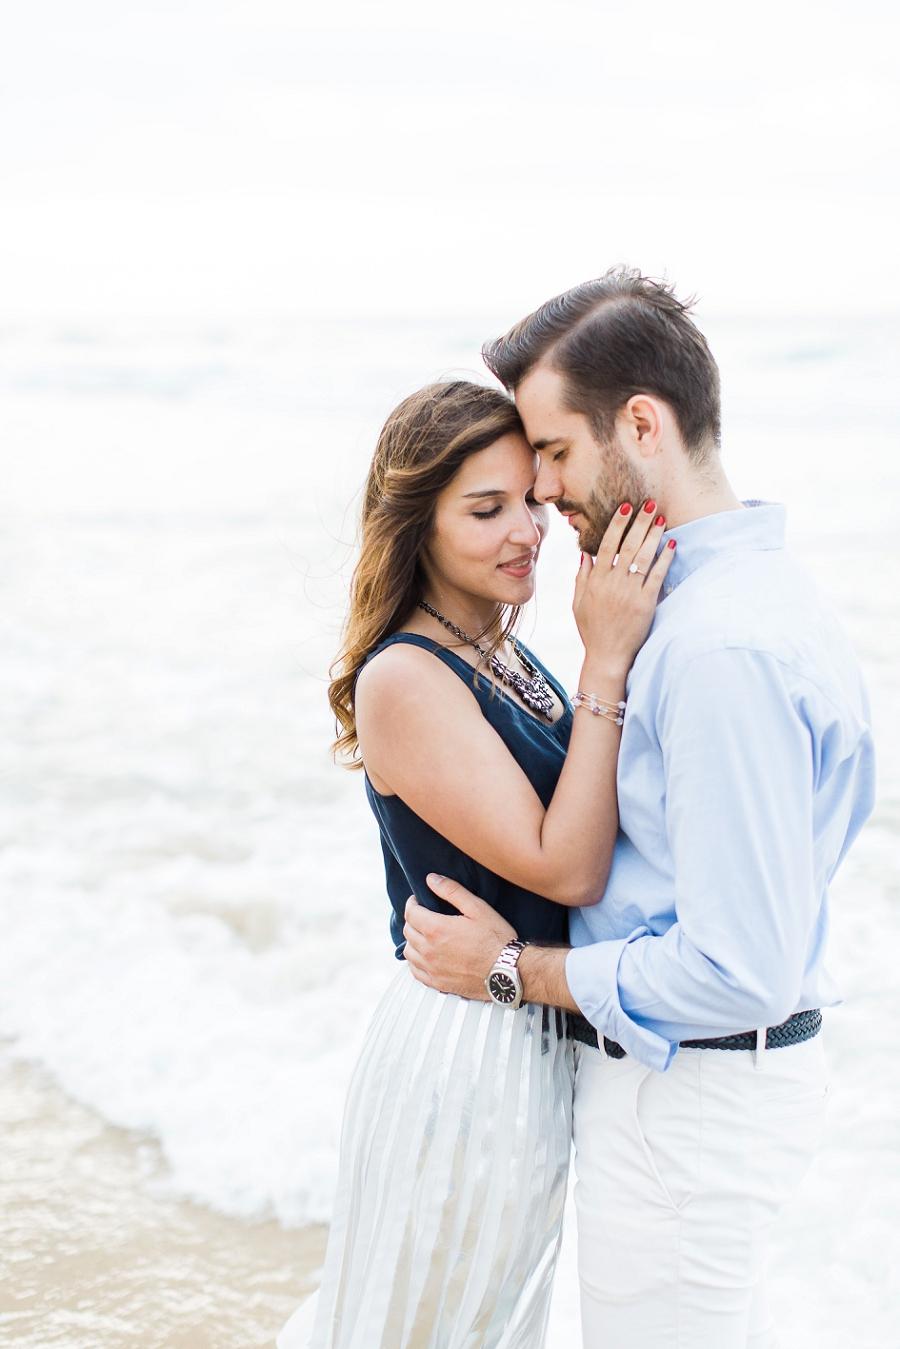 Fuerteventura-Beach-Engagement-Tanja Kibogo_ (17).JPG